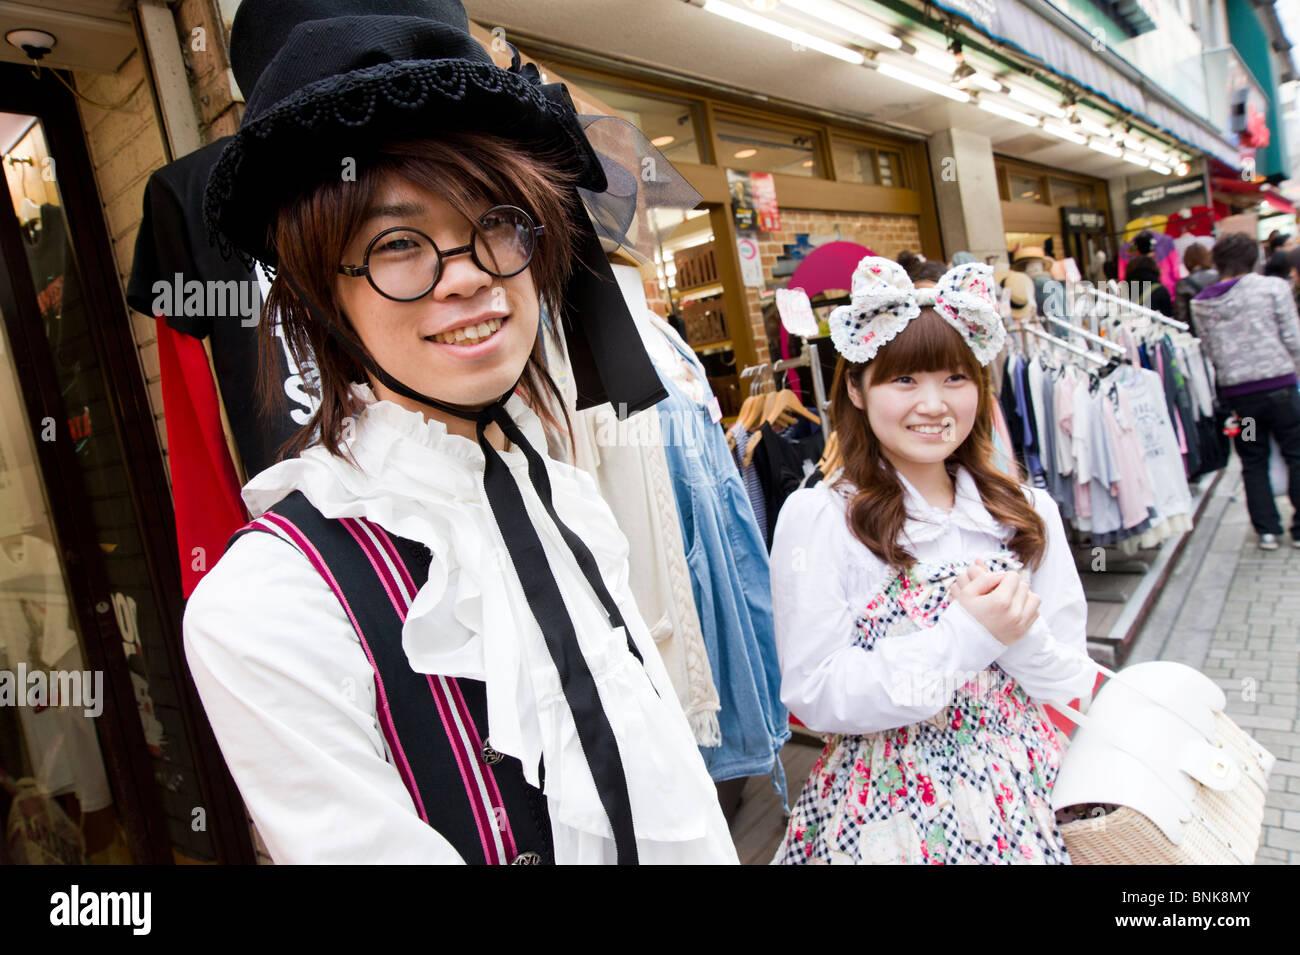 Teenagers wearing cosplay clothes on Takeshita Dori in Harajuku, Tokyo, Japan - Stock Image